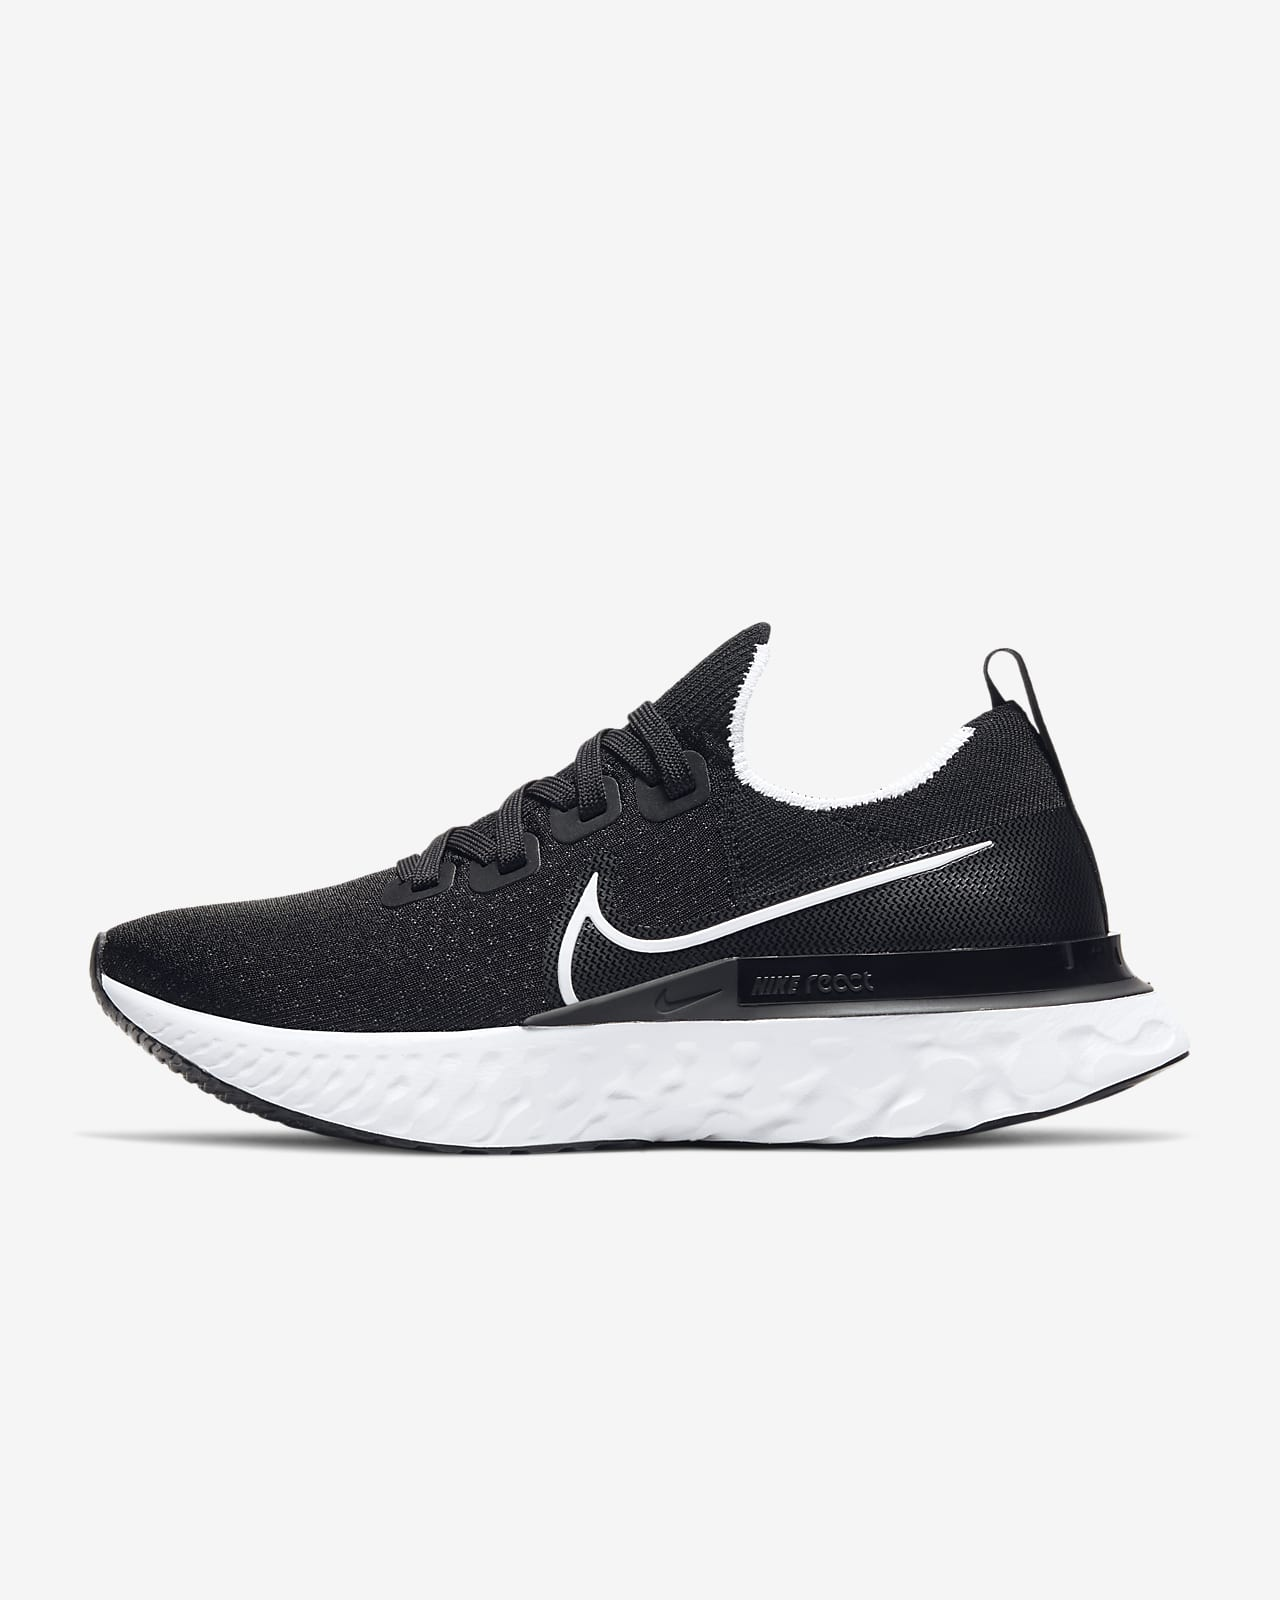 Remontarse invención a lo largo  Nike React Infinity Run Flyknit Women's Running Shoe. Nike AU